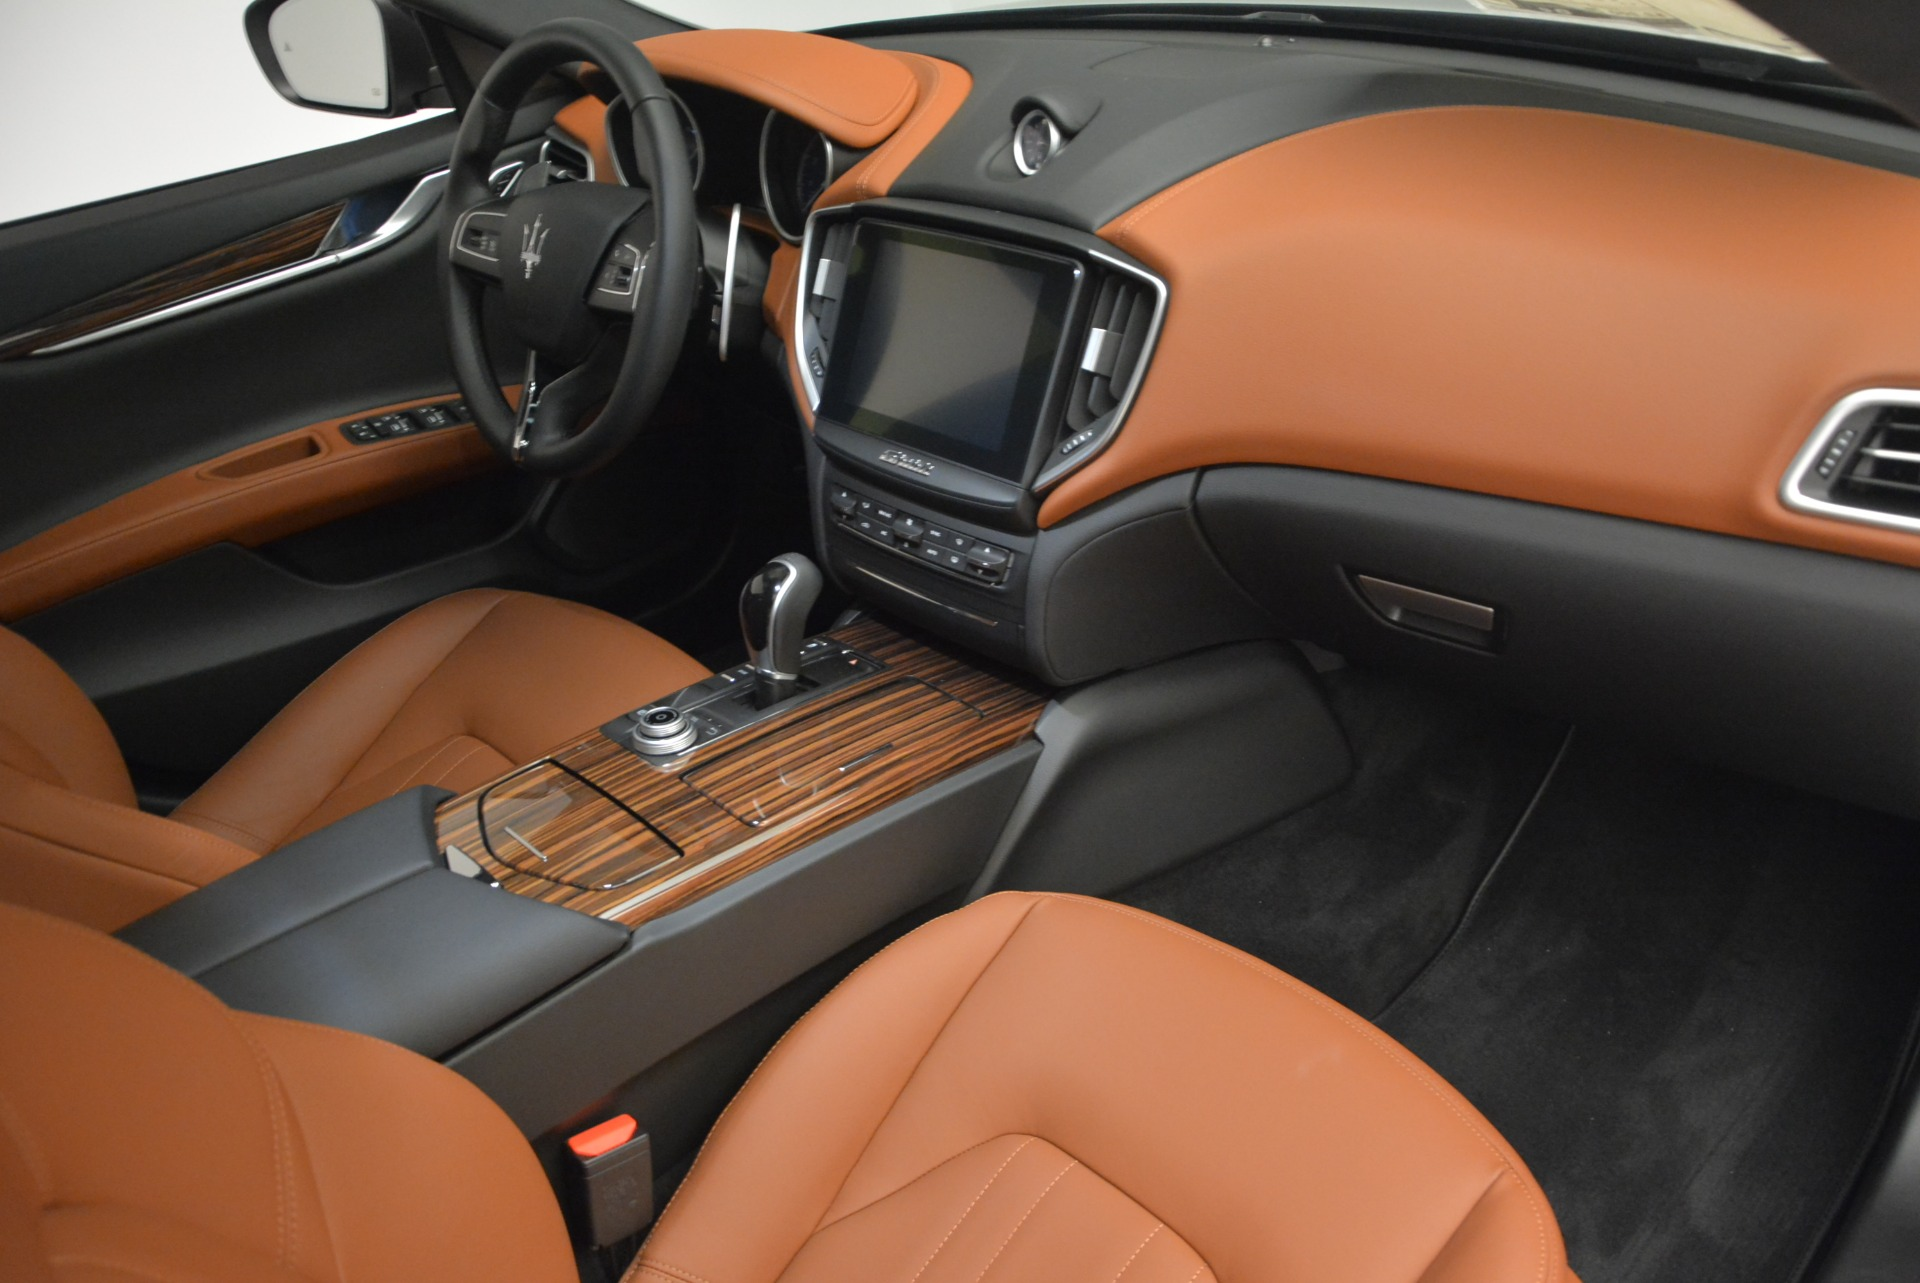 Used 2017 Maserati Ghibli S Q4 EX-LOANER For Sale In Westport, CT 608_p20